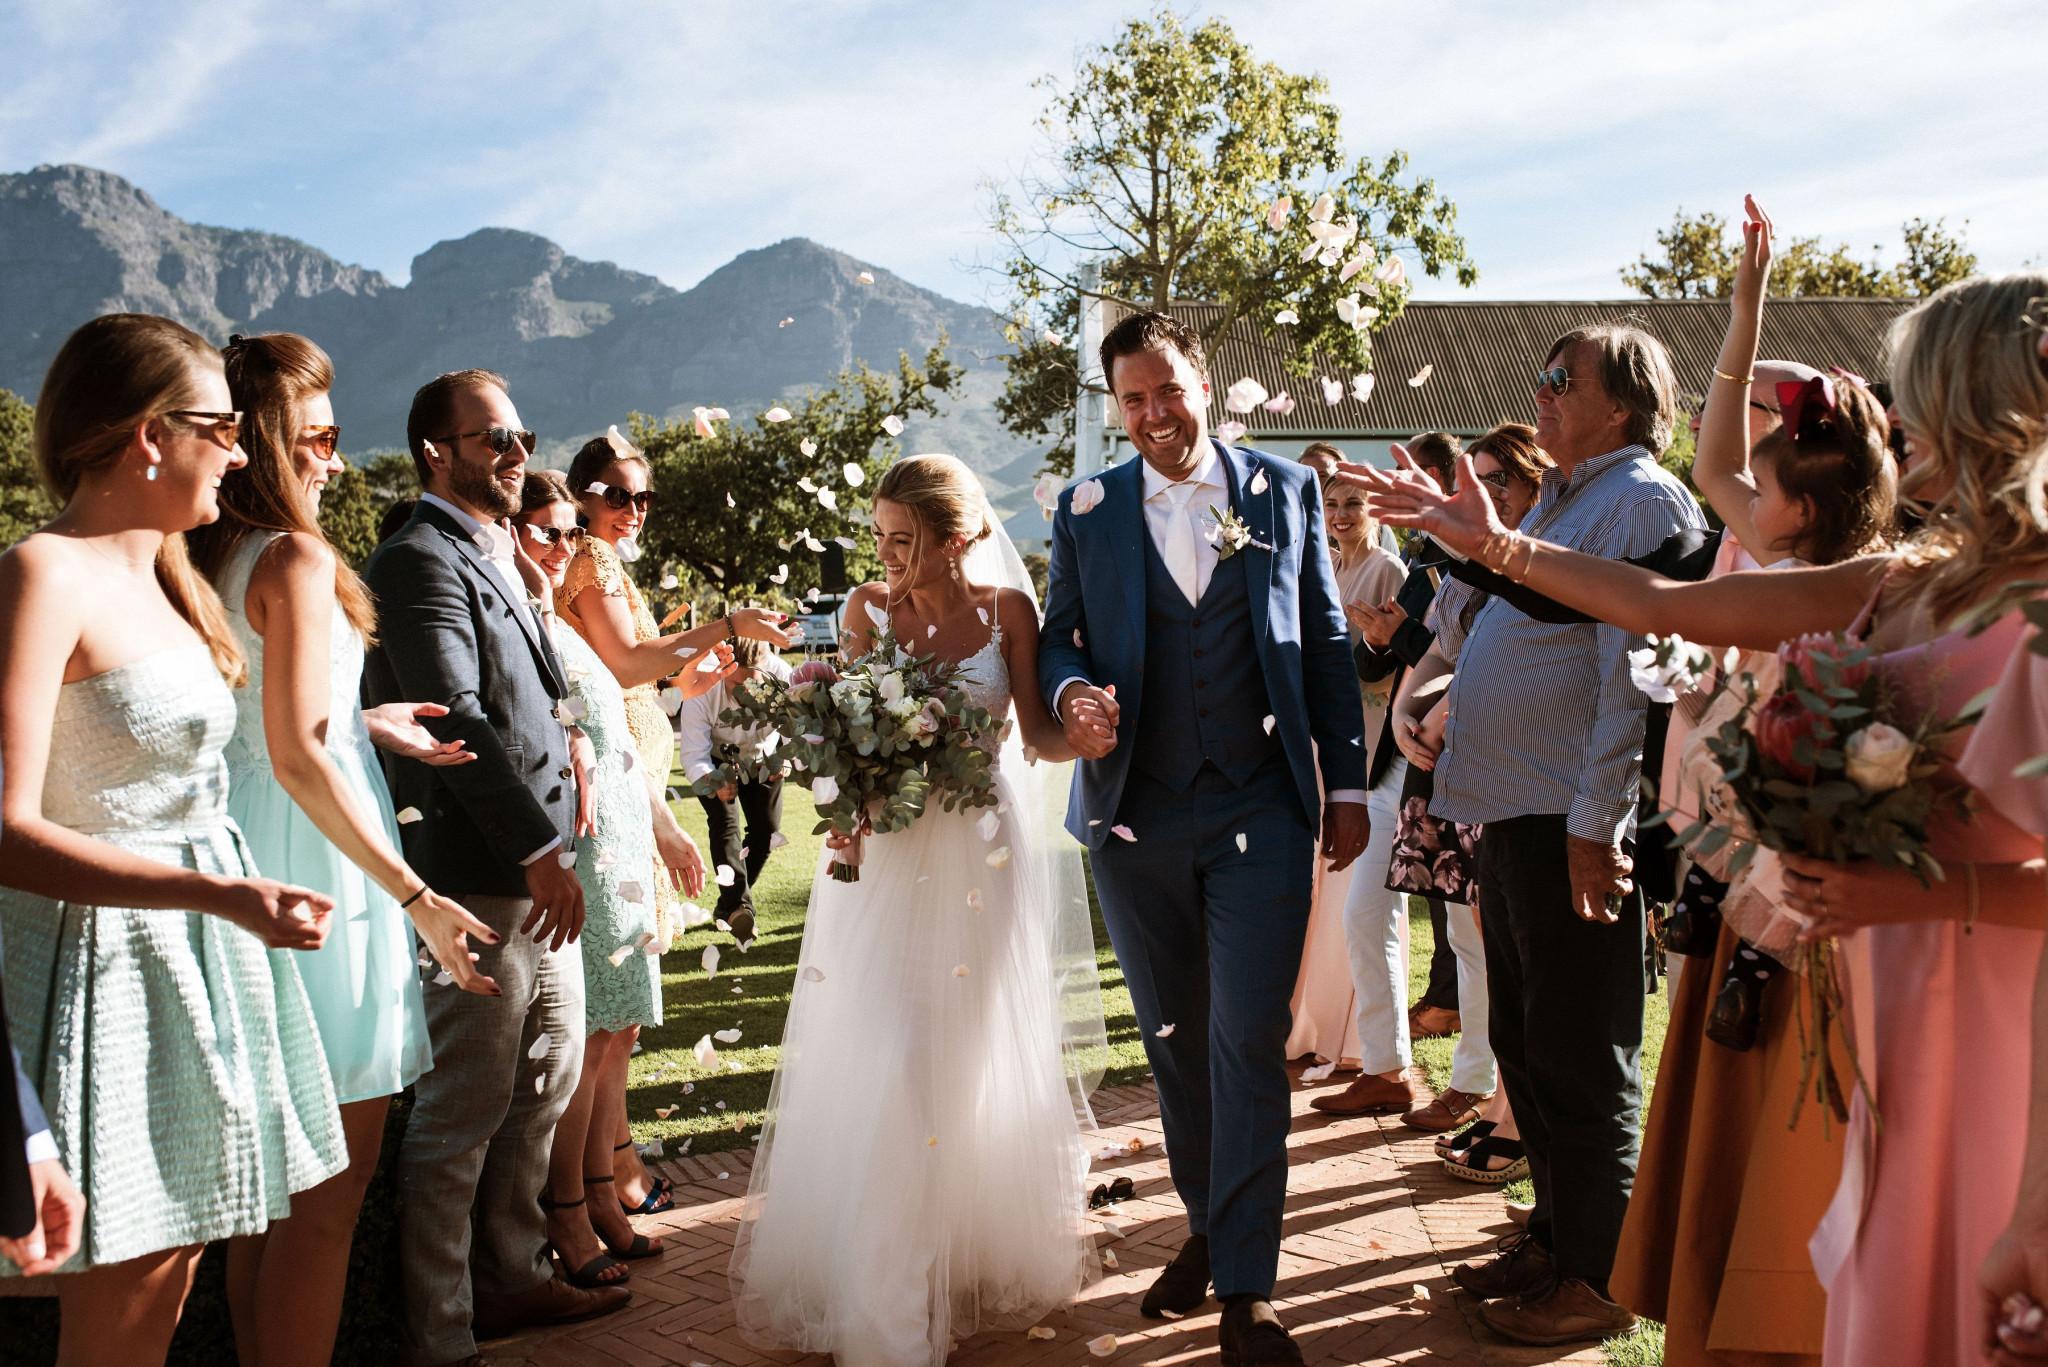 Huwelijkswensen Theperfectweddingnl